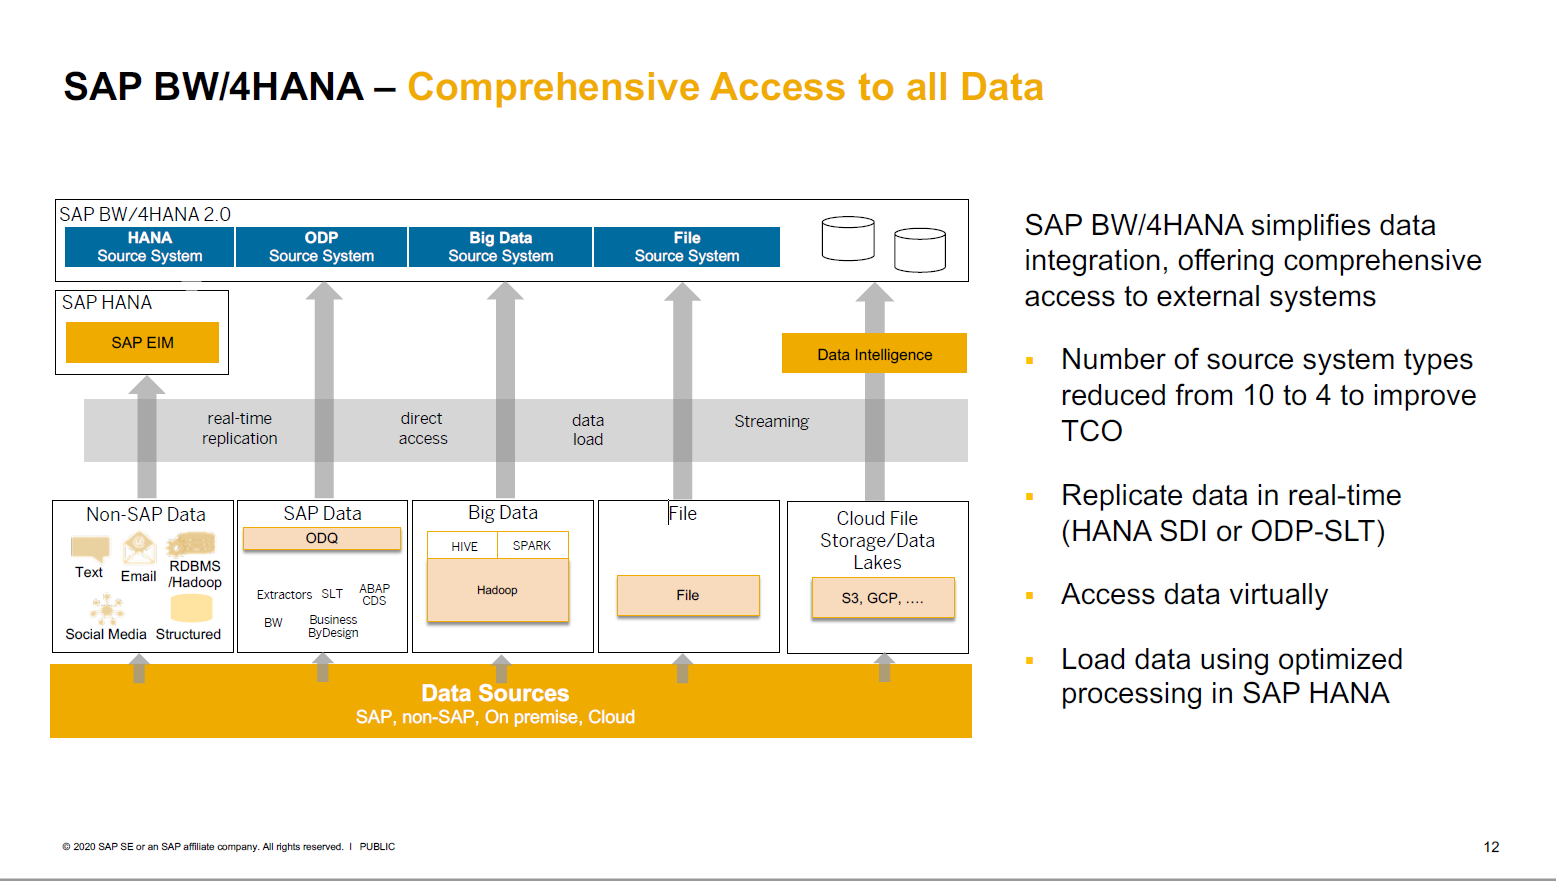 Vereinfachte Datenanbindung in SAP BW/4HANA